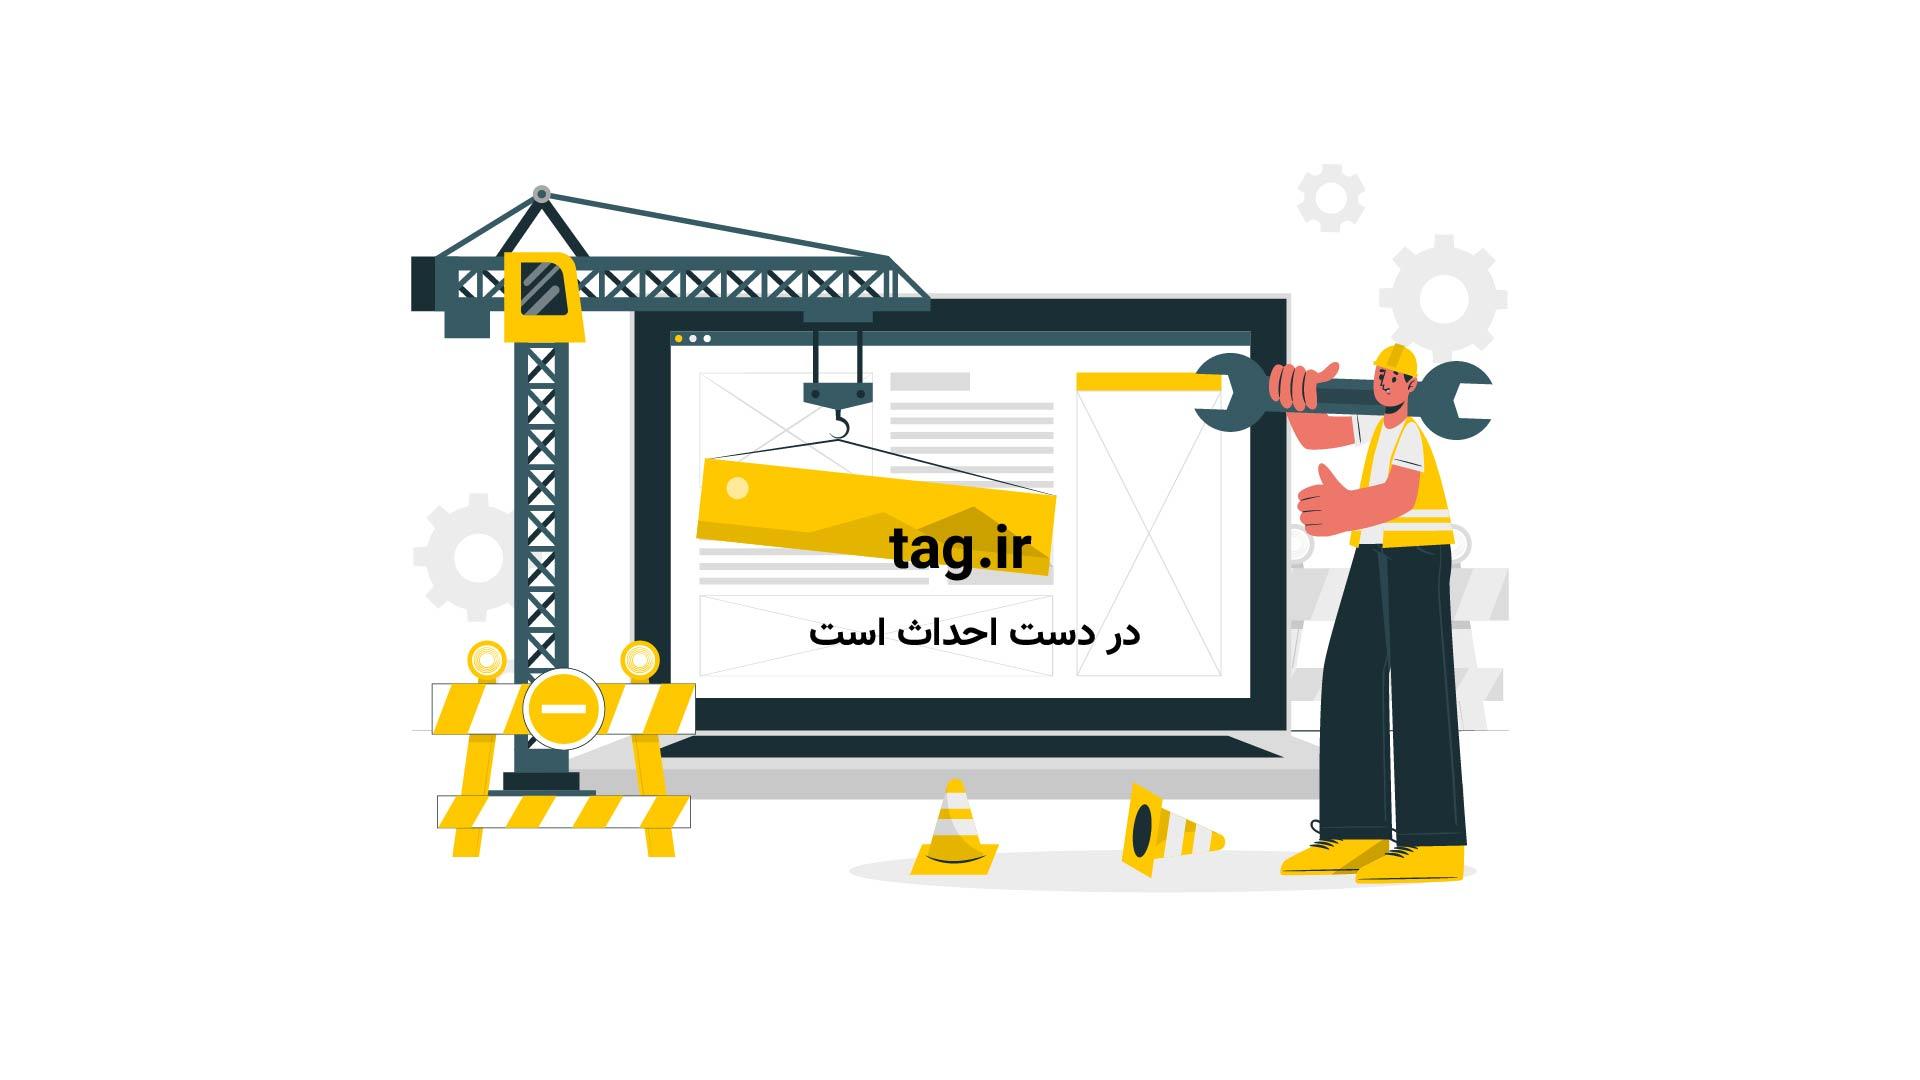 دهها کشته و زخمی در هجوم تماشاگران به استادیوم فوتبال آنگولا   فیلم